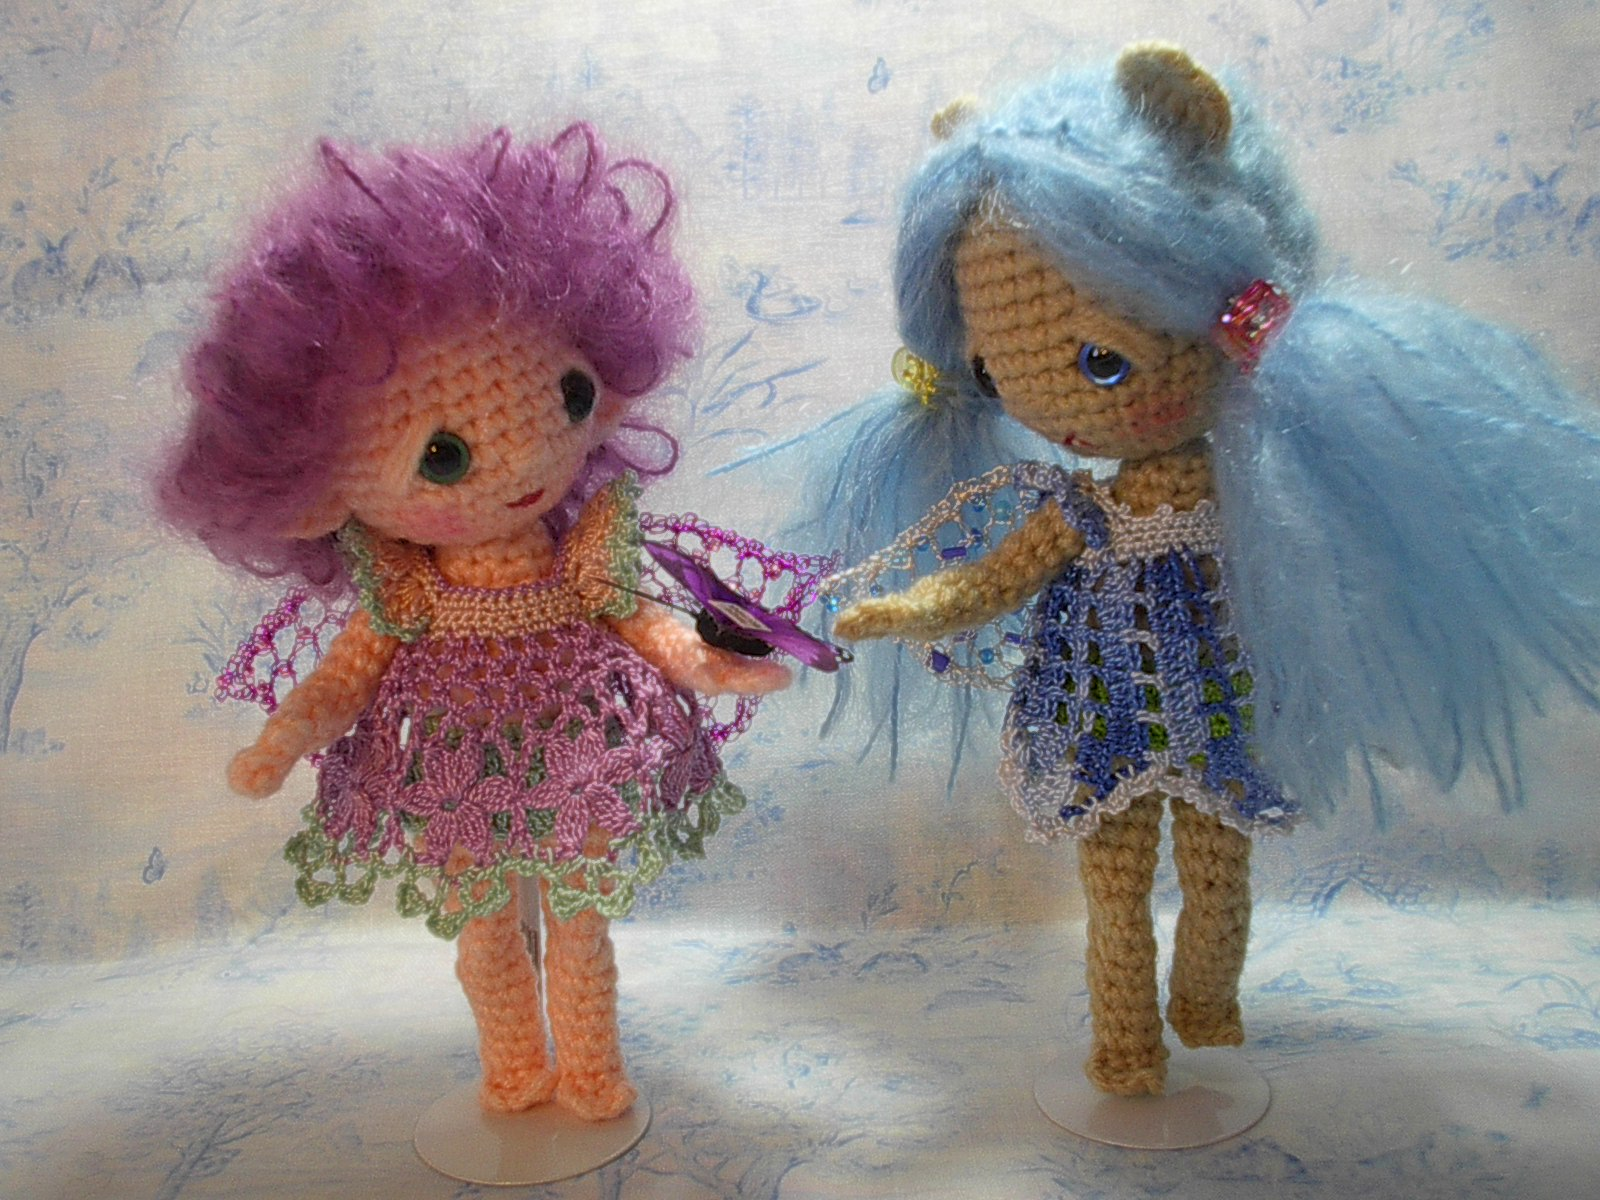 Amigurumi Doll Free Crochet Pattern : By hook by hand: crochet lace for dresses